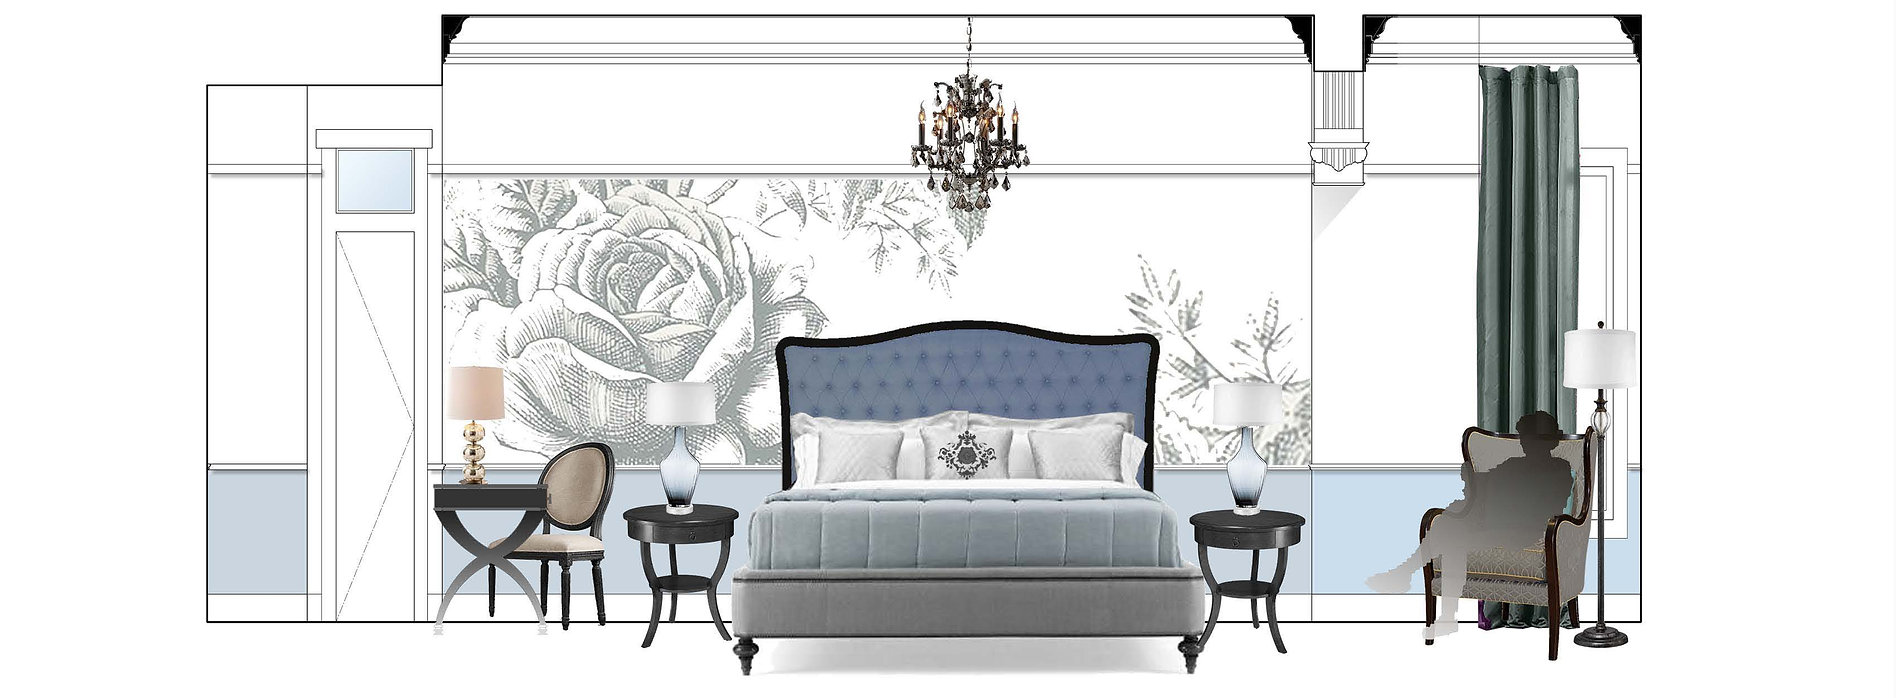 Guest Room Elevation.jpg